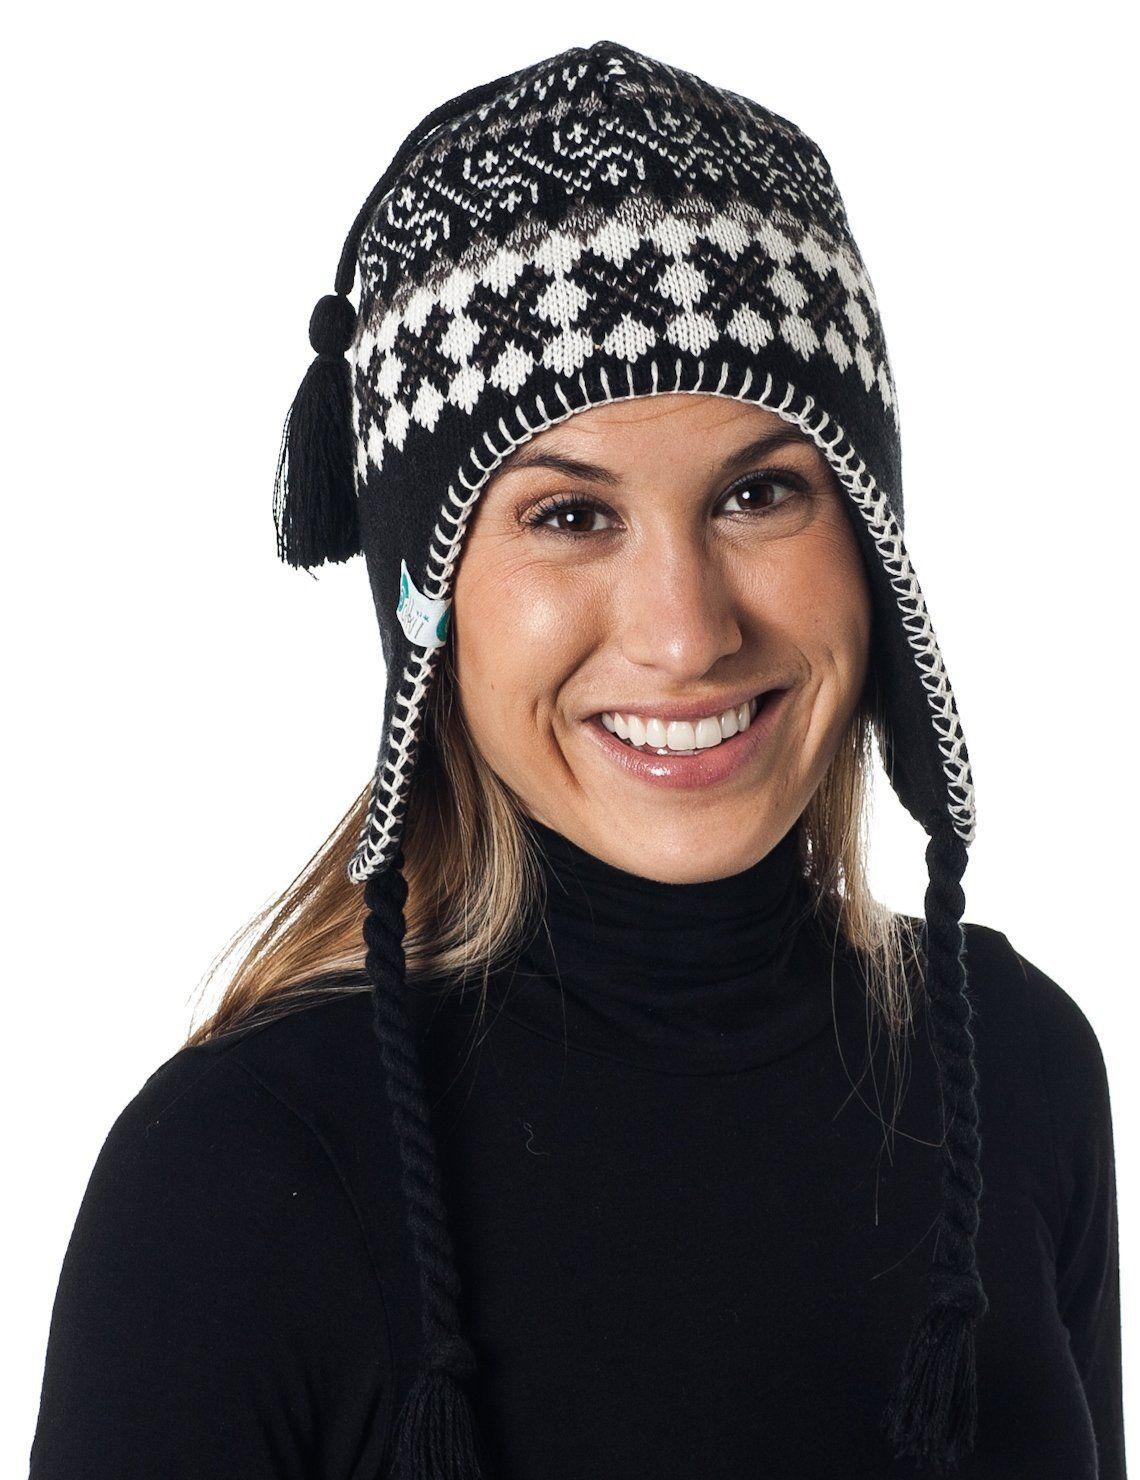 95b8c2ac0fc90 Alki i Braided Aviator womens warm beanie snowboarding winter snow hats - 5  colors ( 9.99)